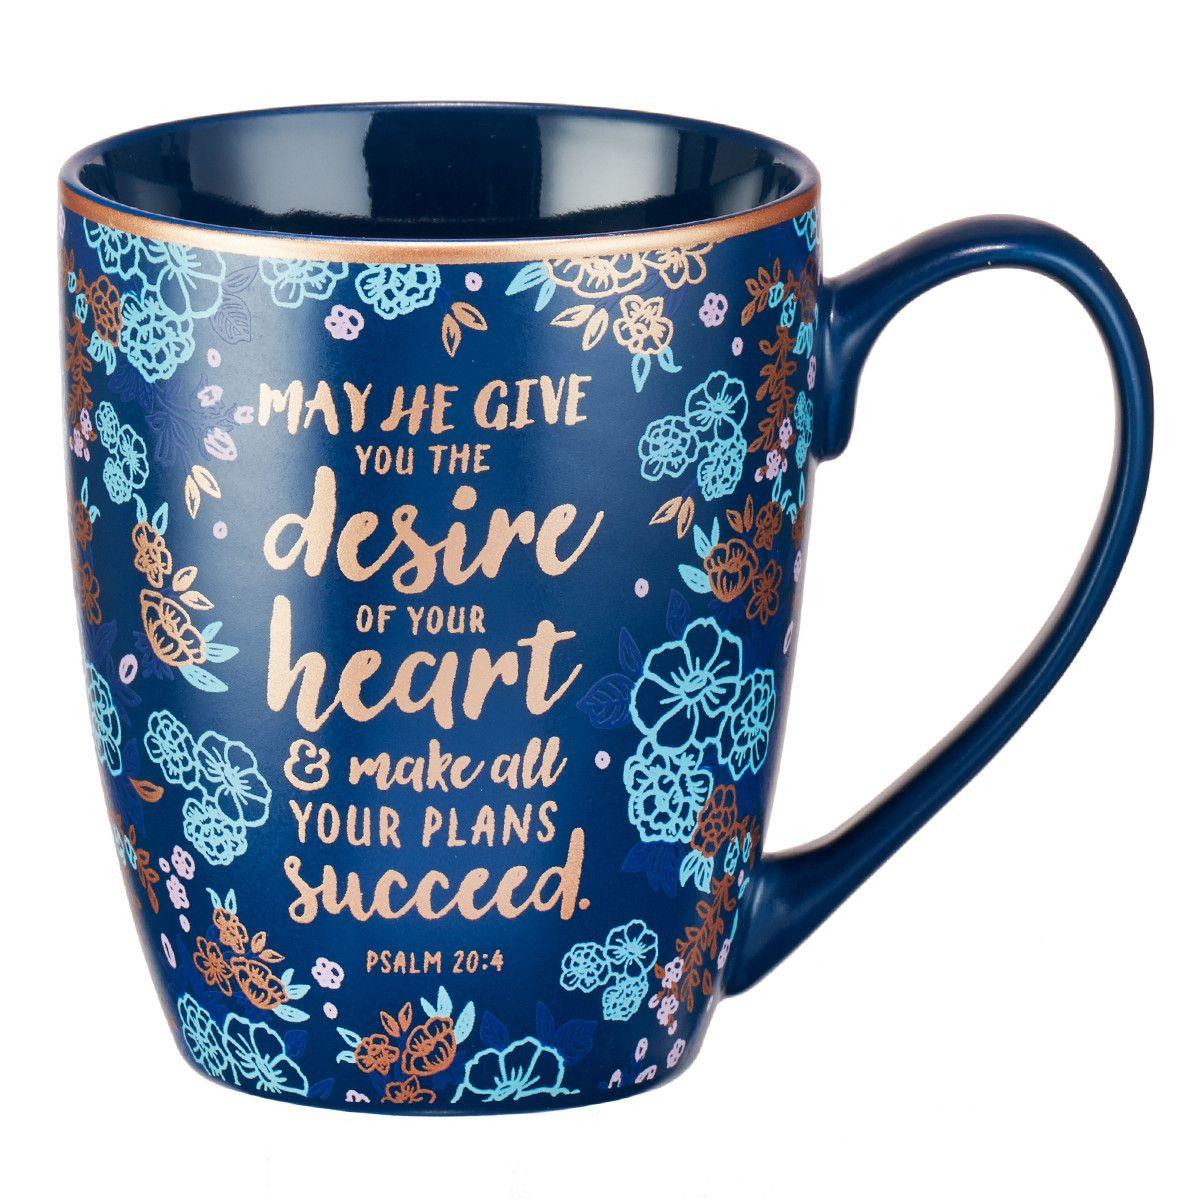 Desire Of Your Heart Coffee Mug Psalm 20 4 Mugs Psalm 20 Gifts In A Mug